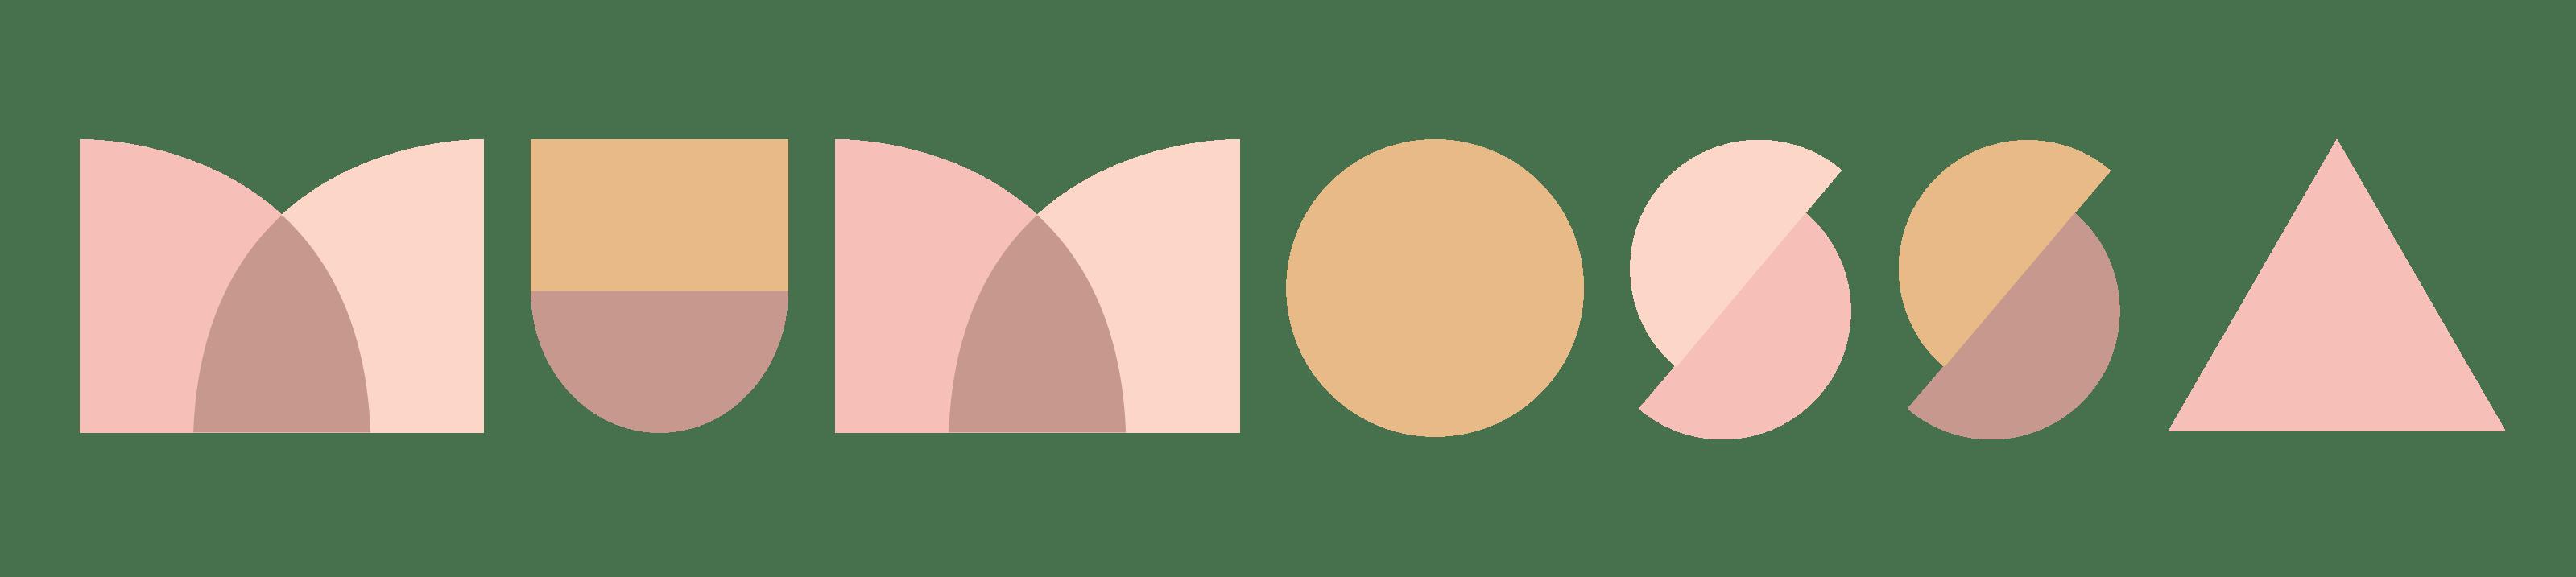 geometric shapes logo_Logo